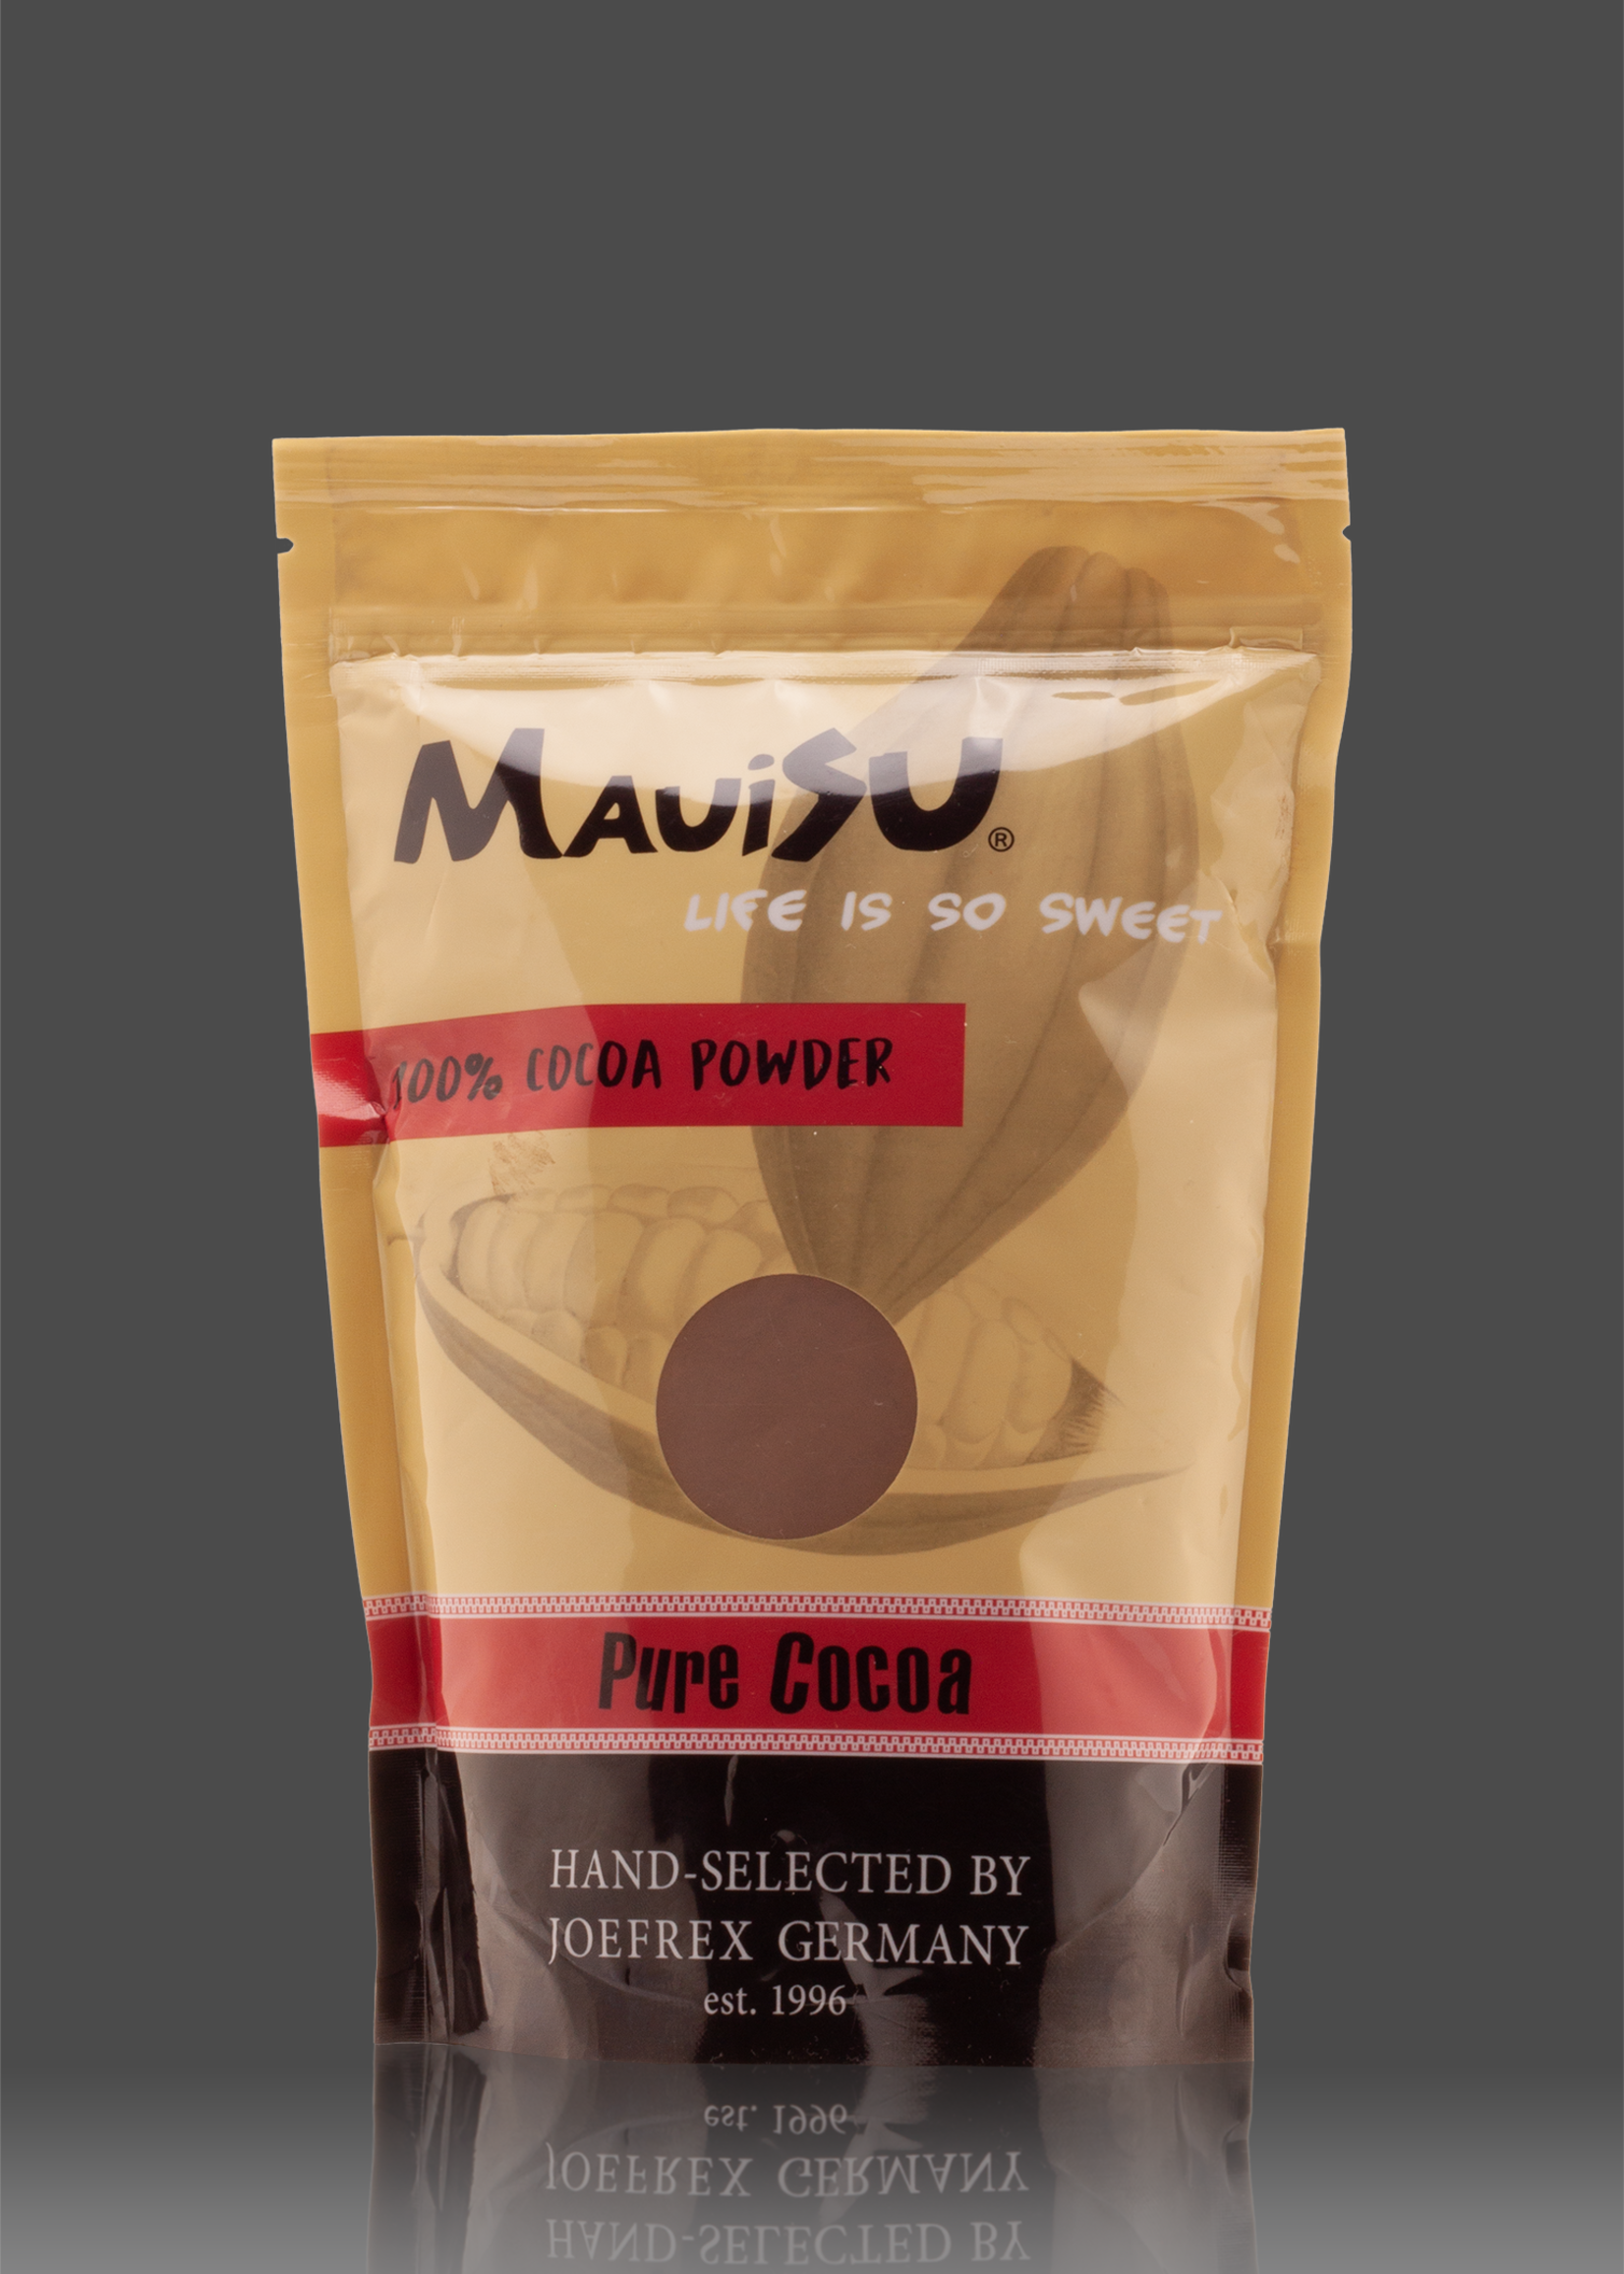 MauiSU 100% cocoa powder without sugar